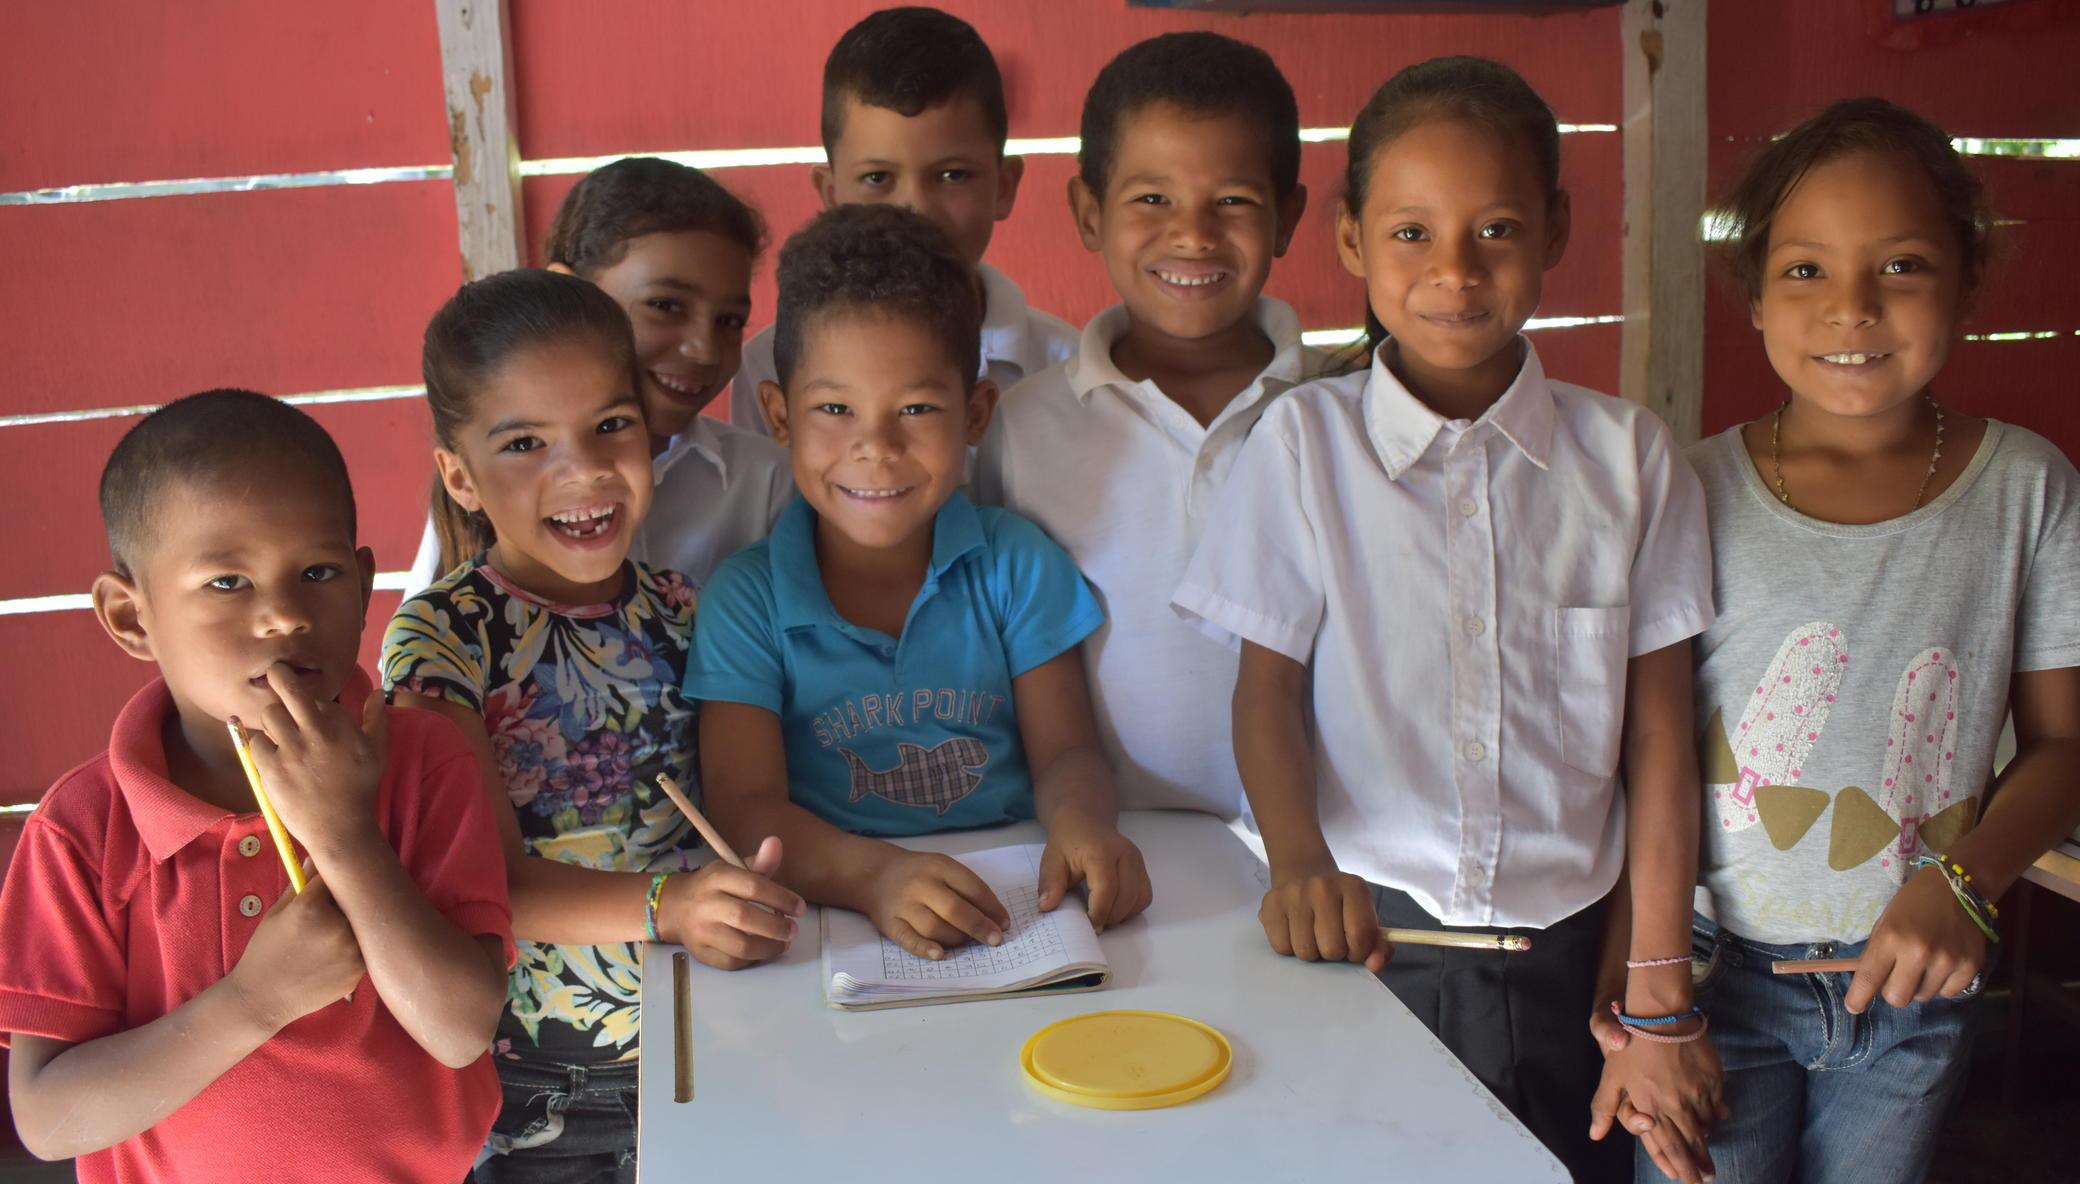 Build a school for 115 children in Guaruchal